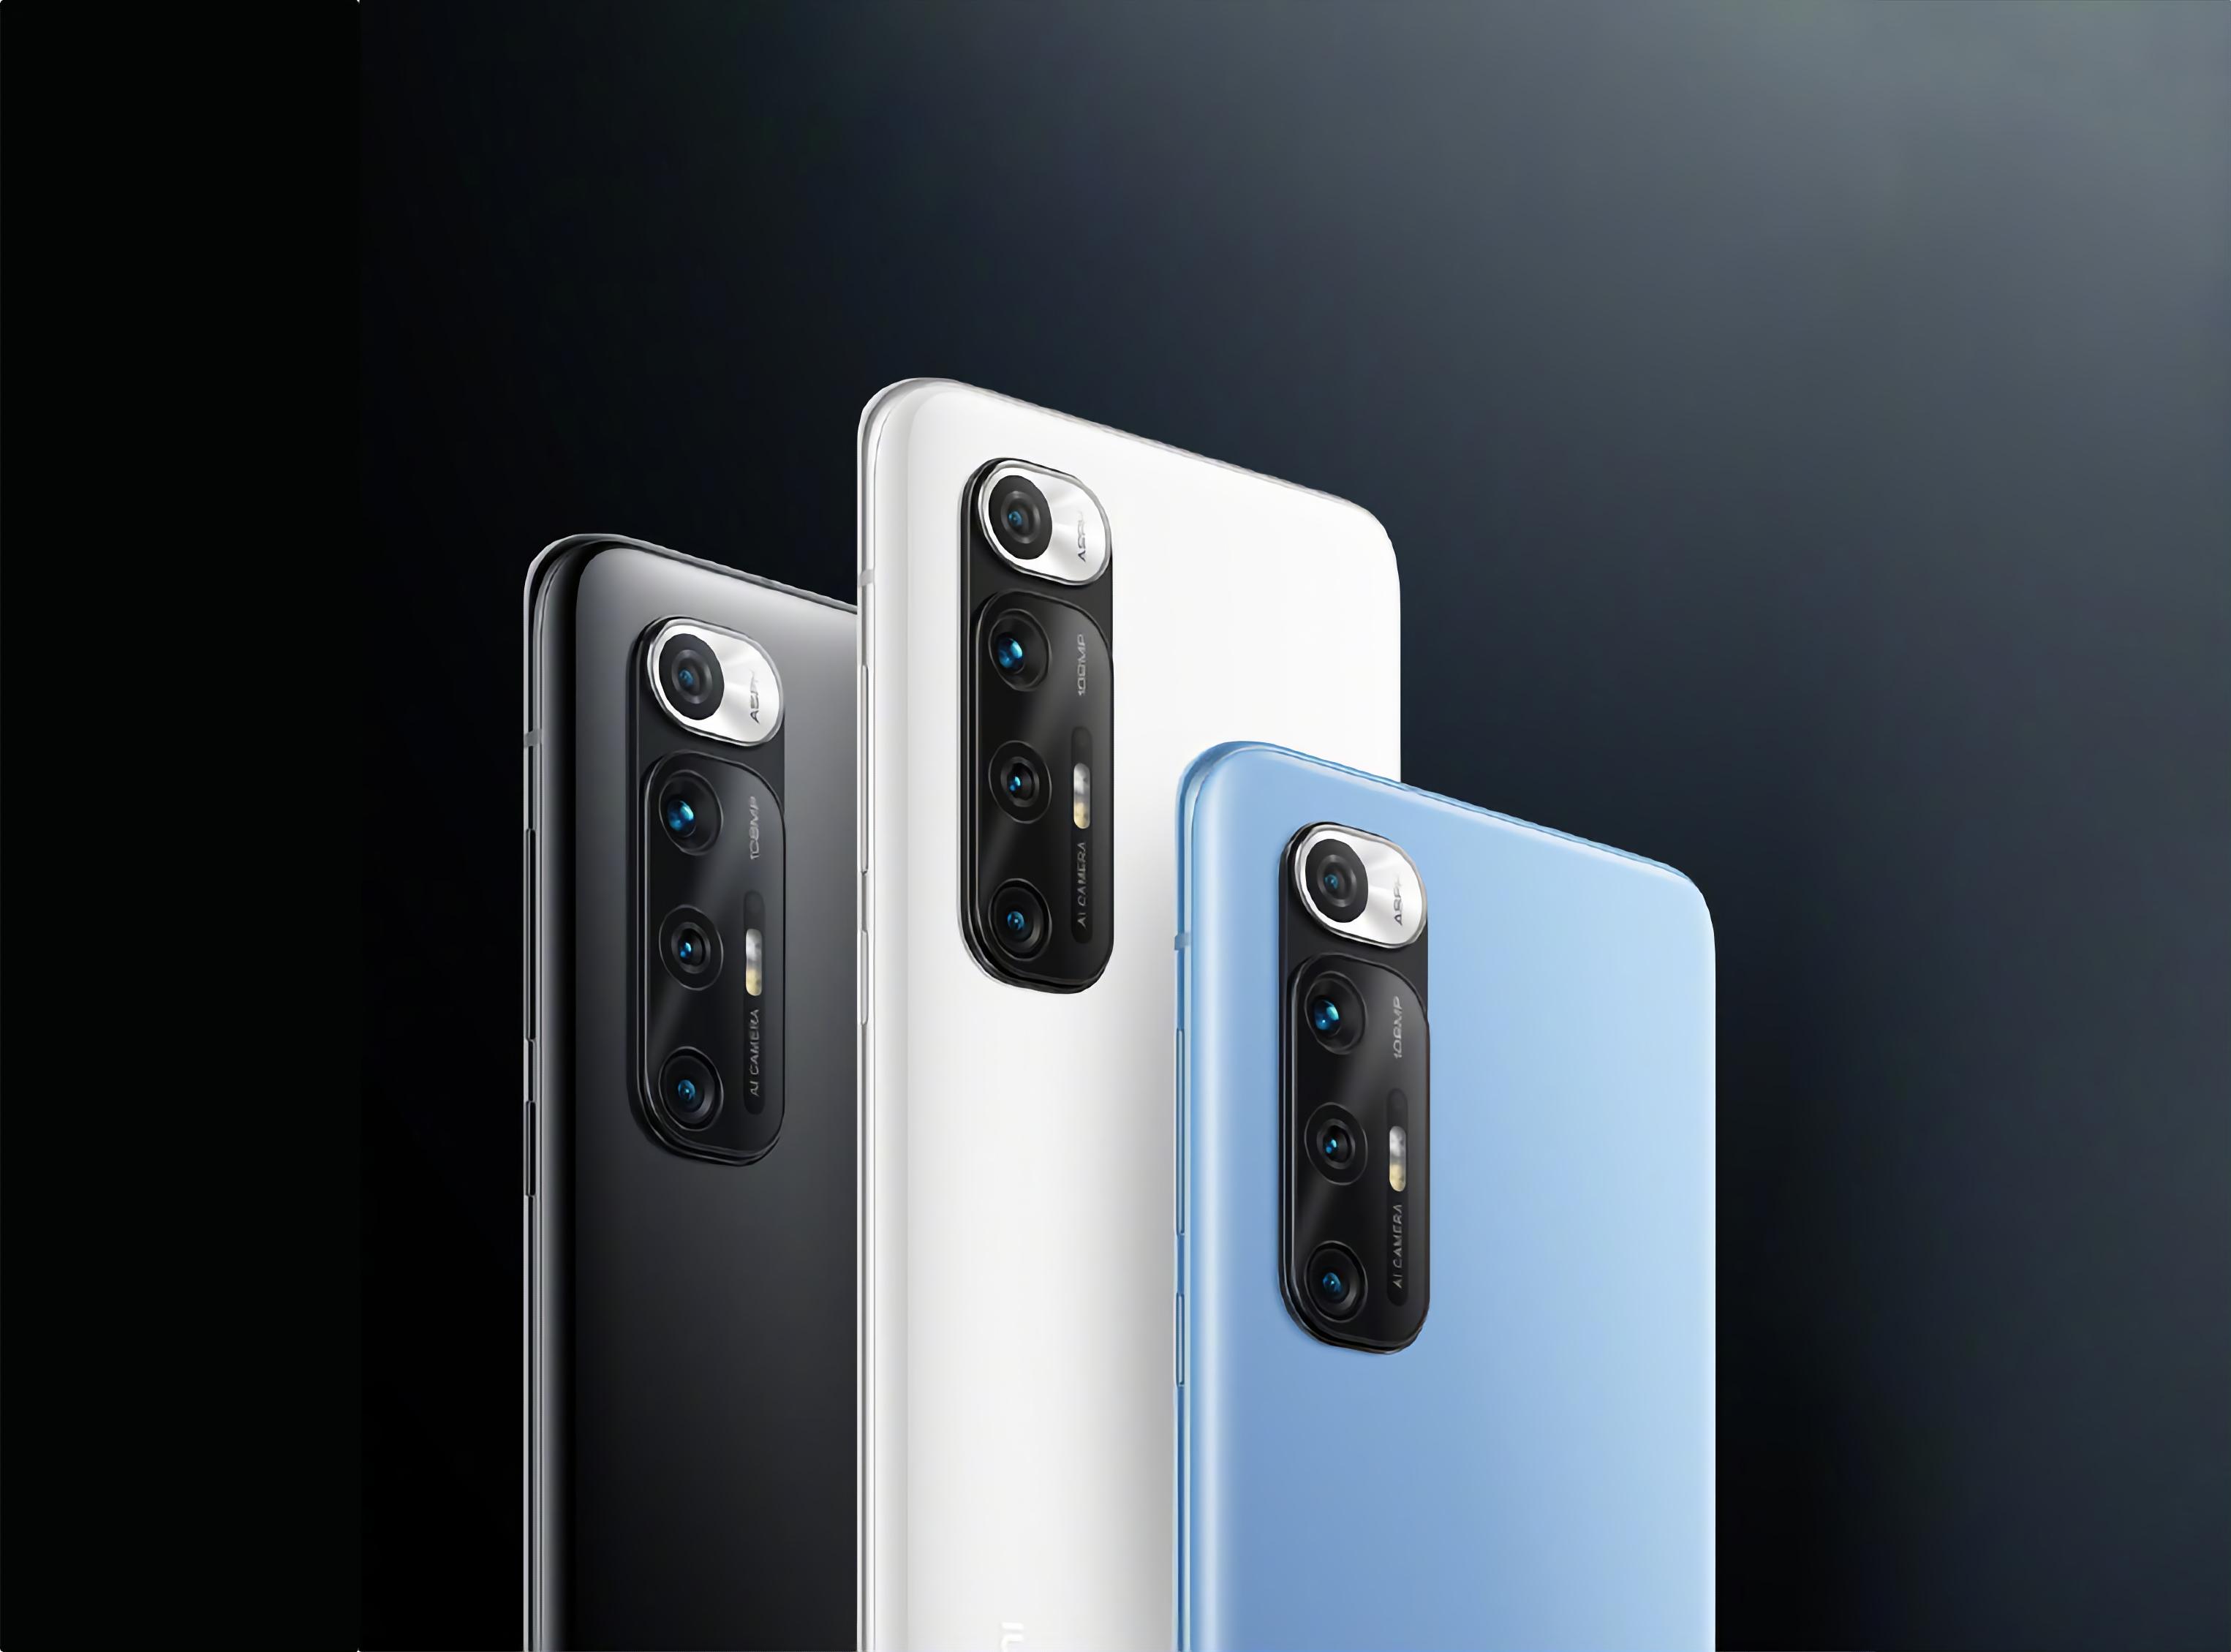 Официально: Xiaomi Mi 10S с процессором Snapdragon 870 на борту анонсируют 10 марта